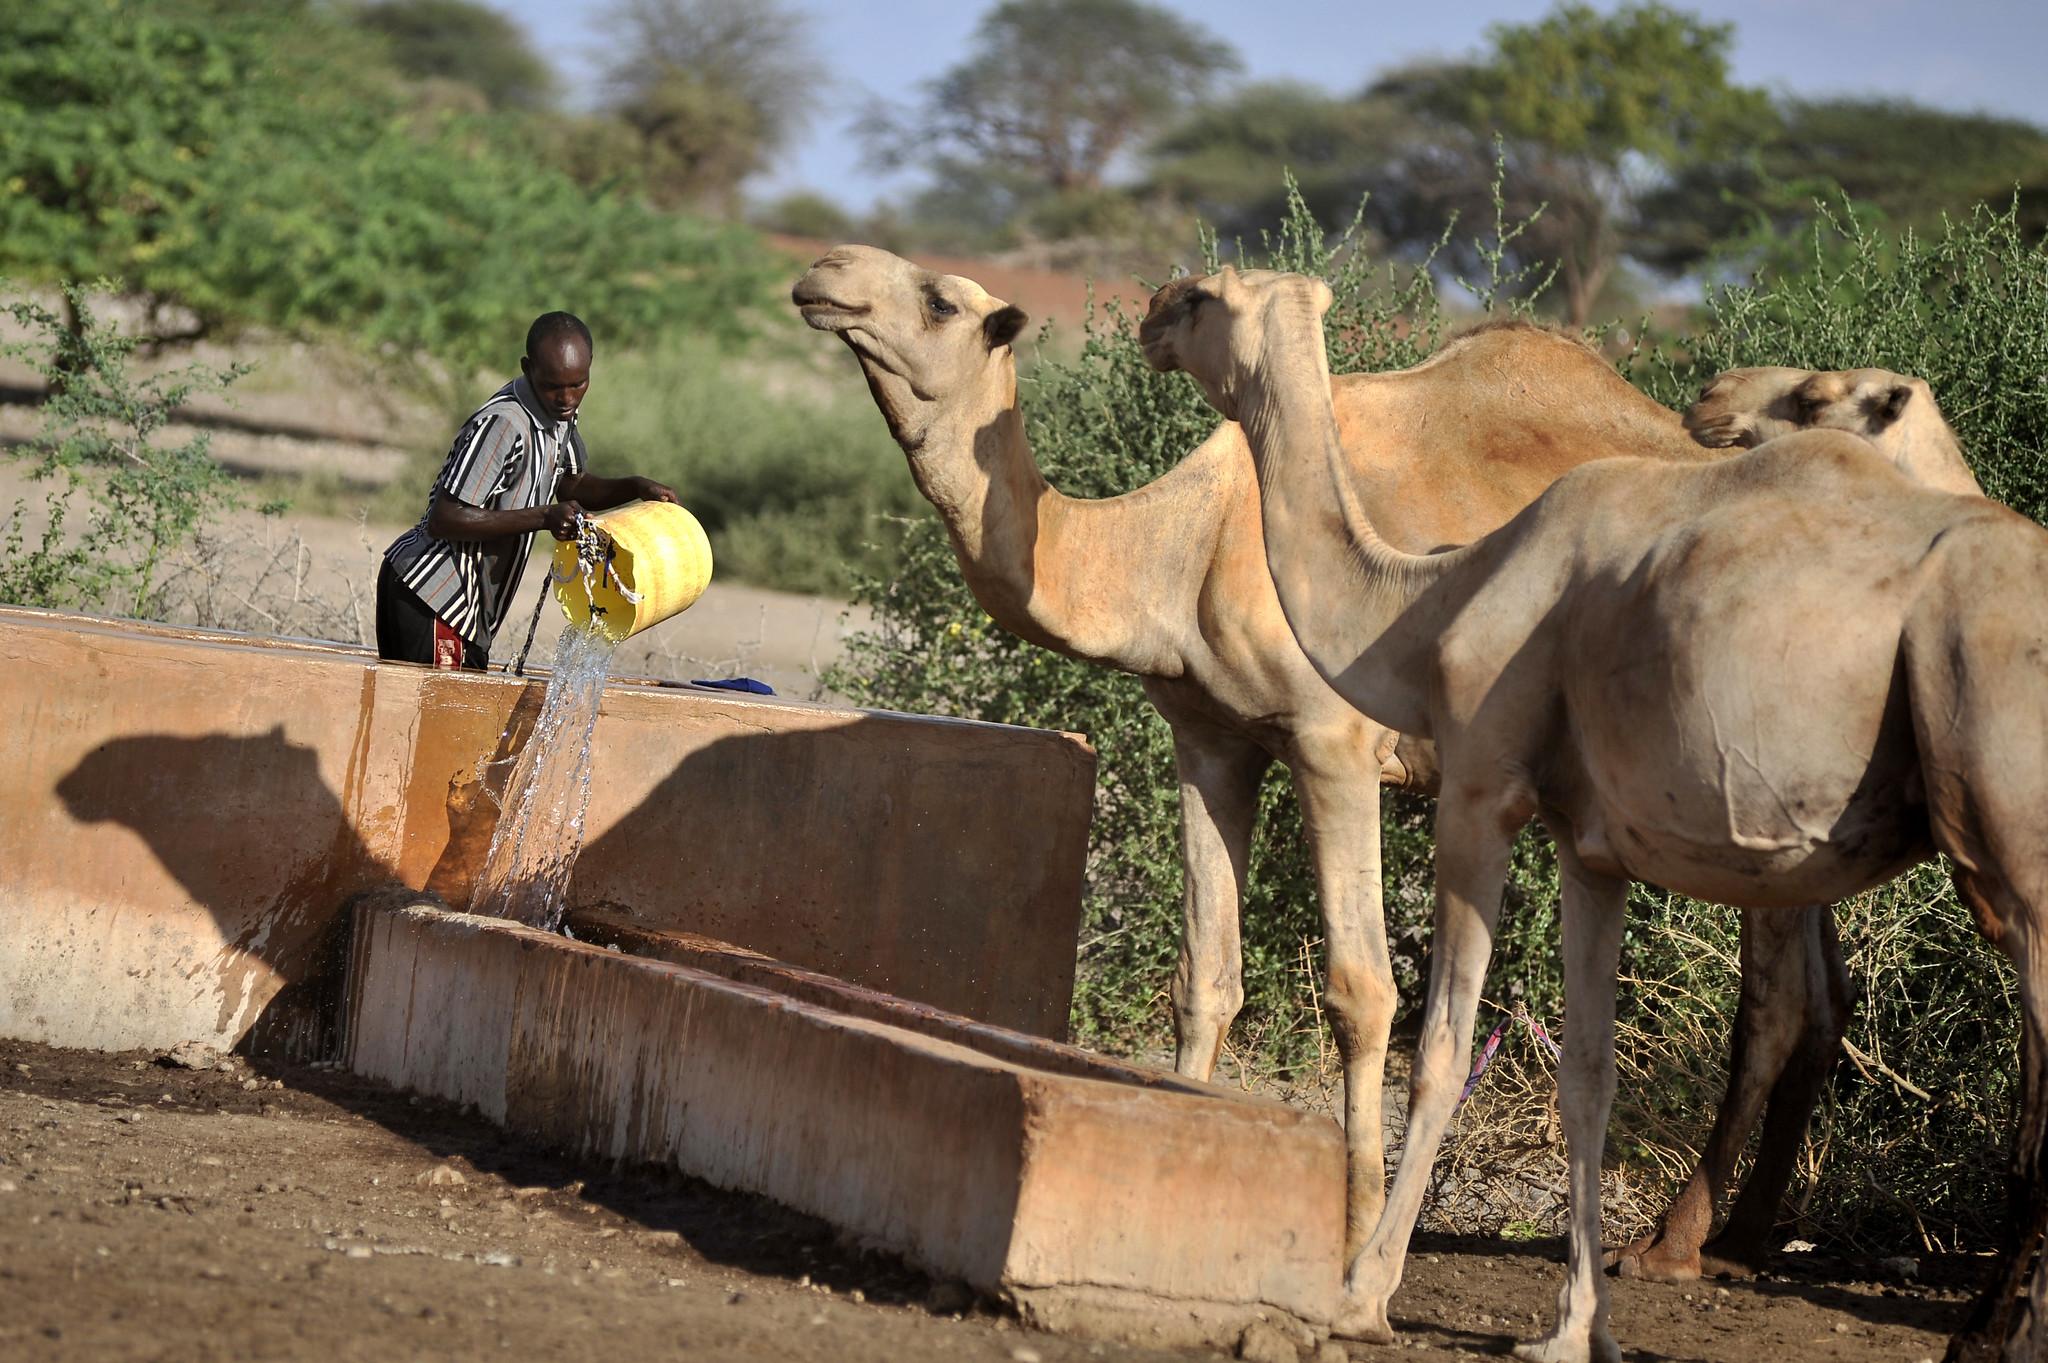 Watering camels near Wajir, northern Kenya